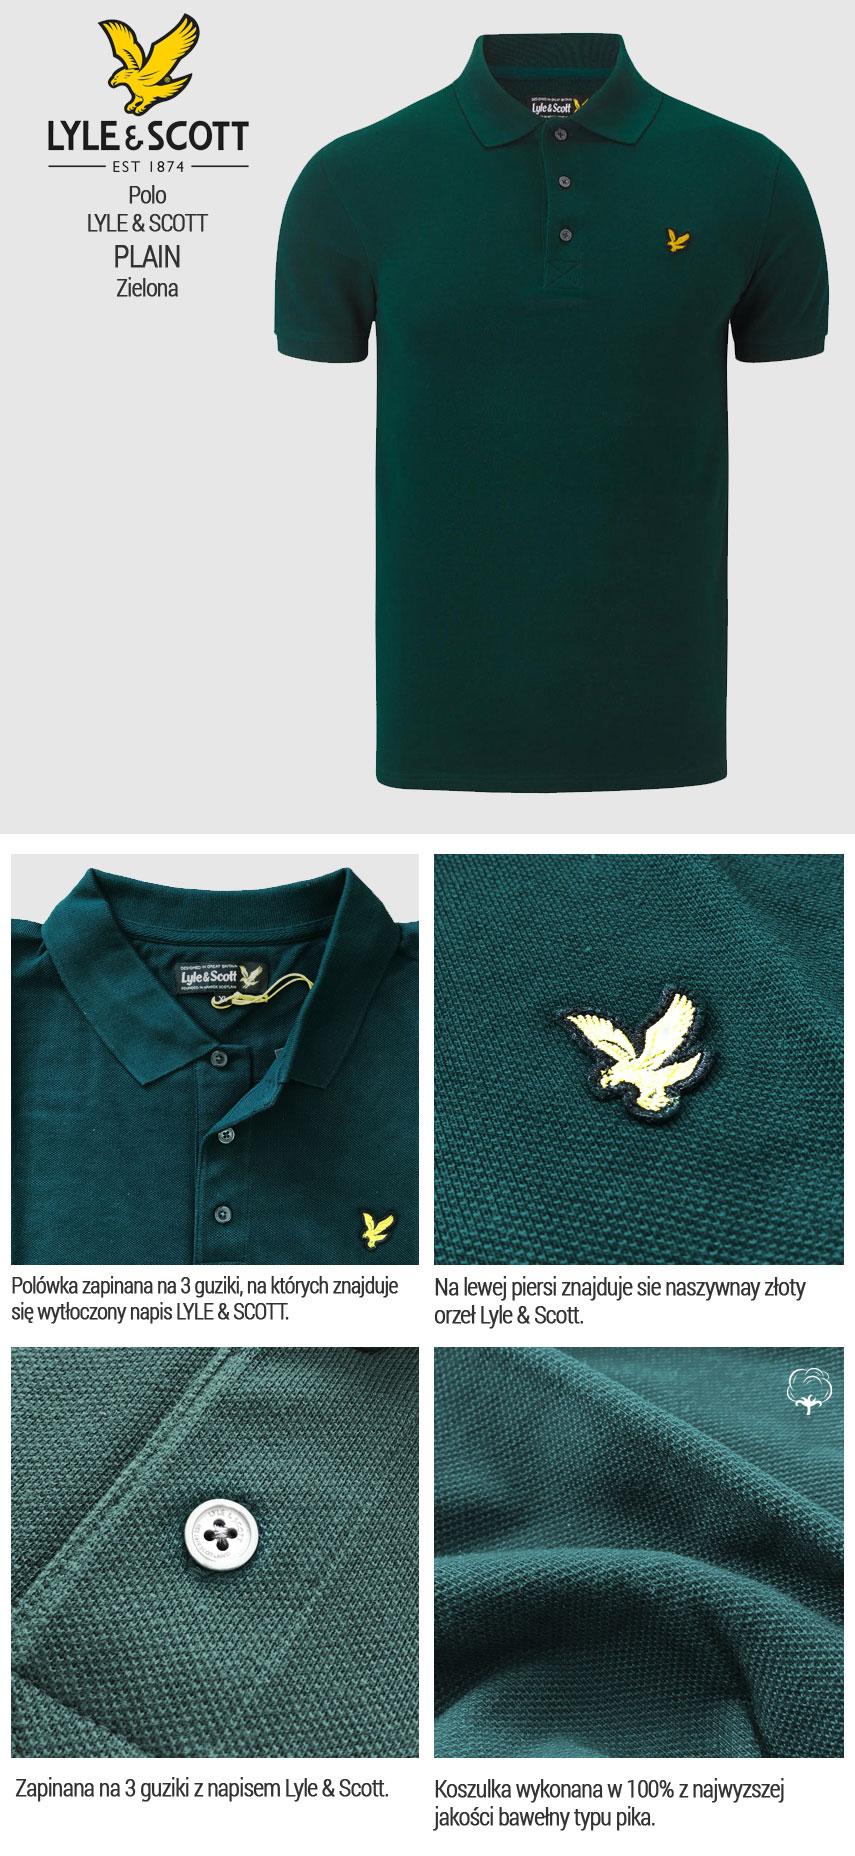 Koszulka Polo Lyle & Scott Pique Zielona